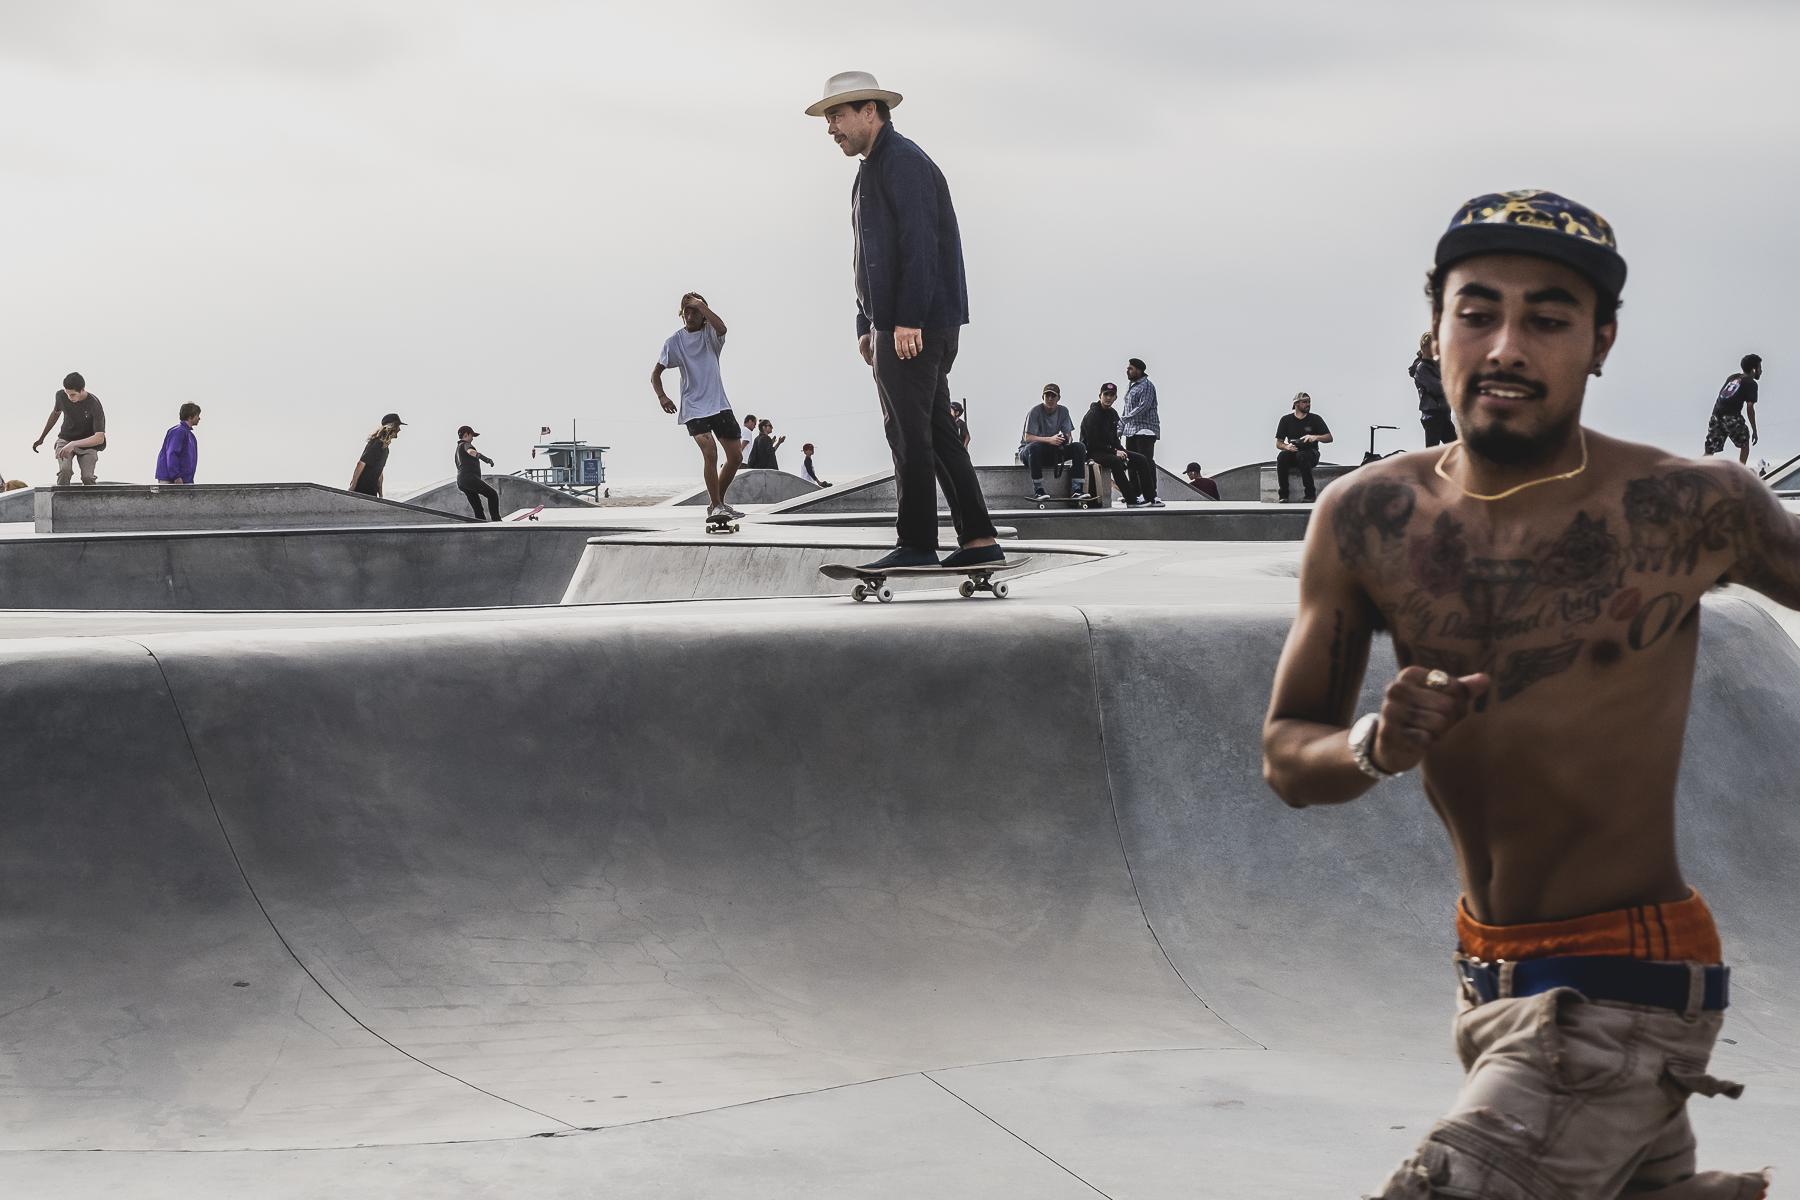 Streetphotography Skaters Los Ángeles, Venice Beach / Zaragoza Walkers